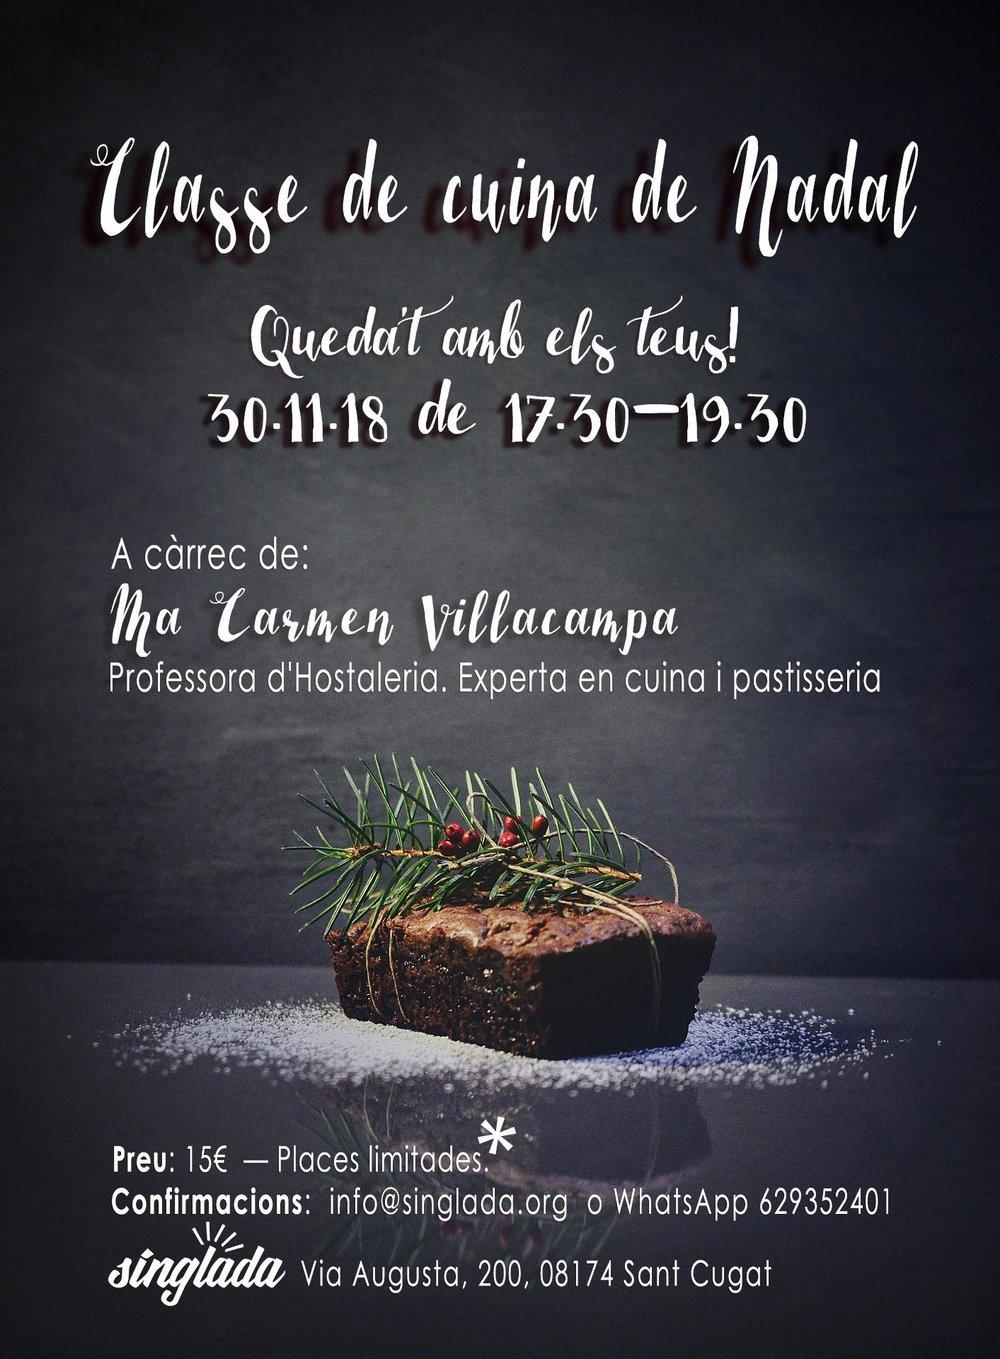 cuina nadal 2018_2.jpg